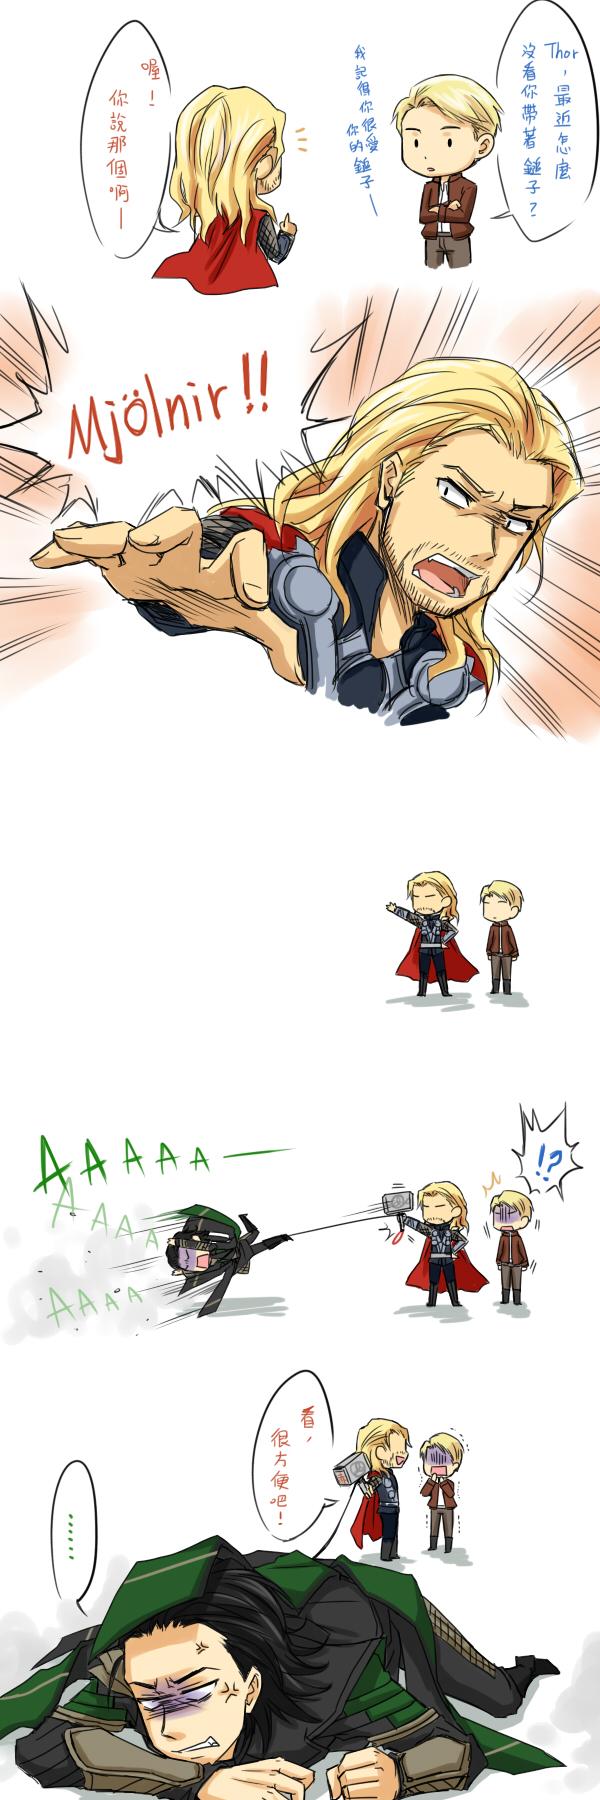 Tags: Anime, Yuna918, Marvel, The Avengers, Loki Laufeyson, Thor Odinson, Steven Rogers